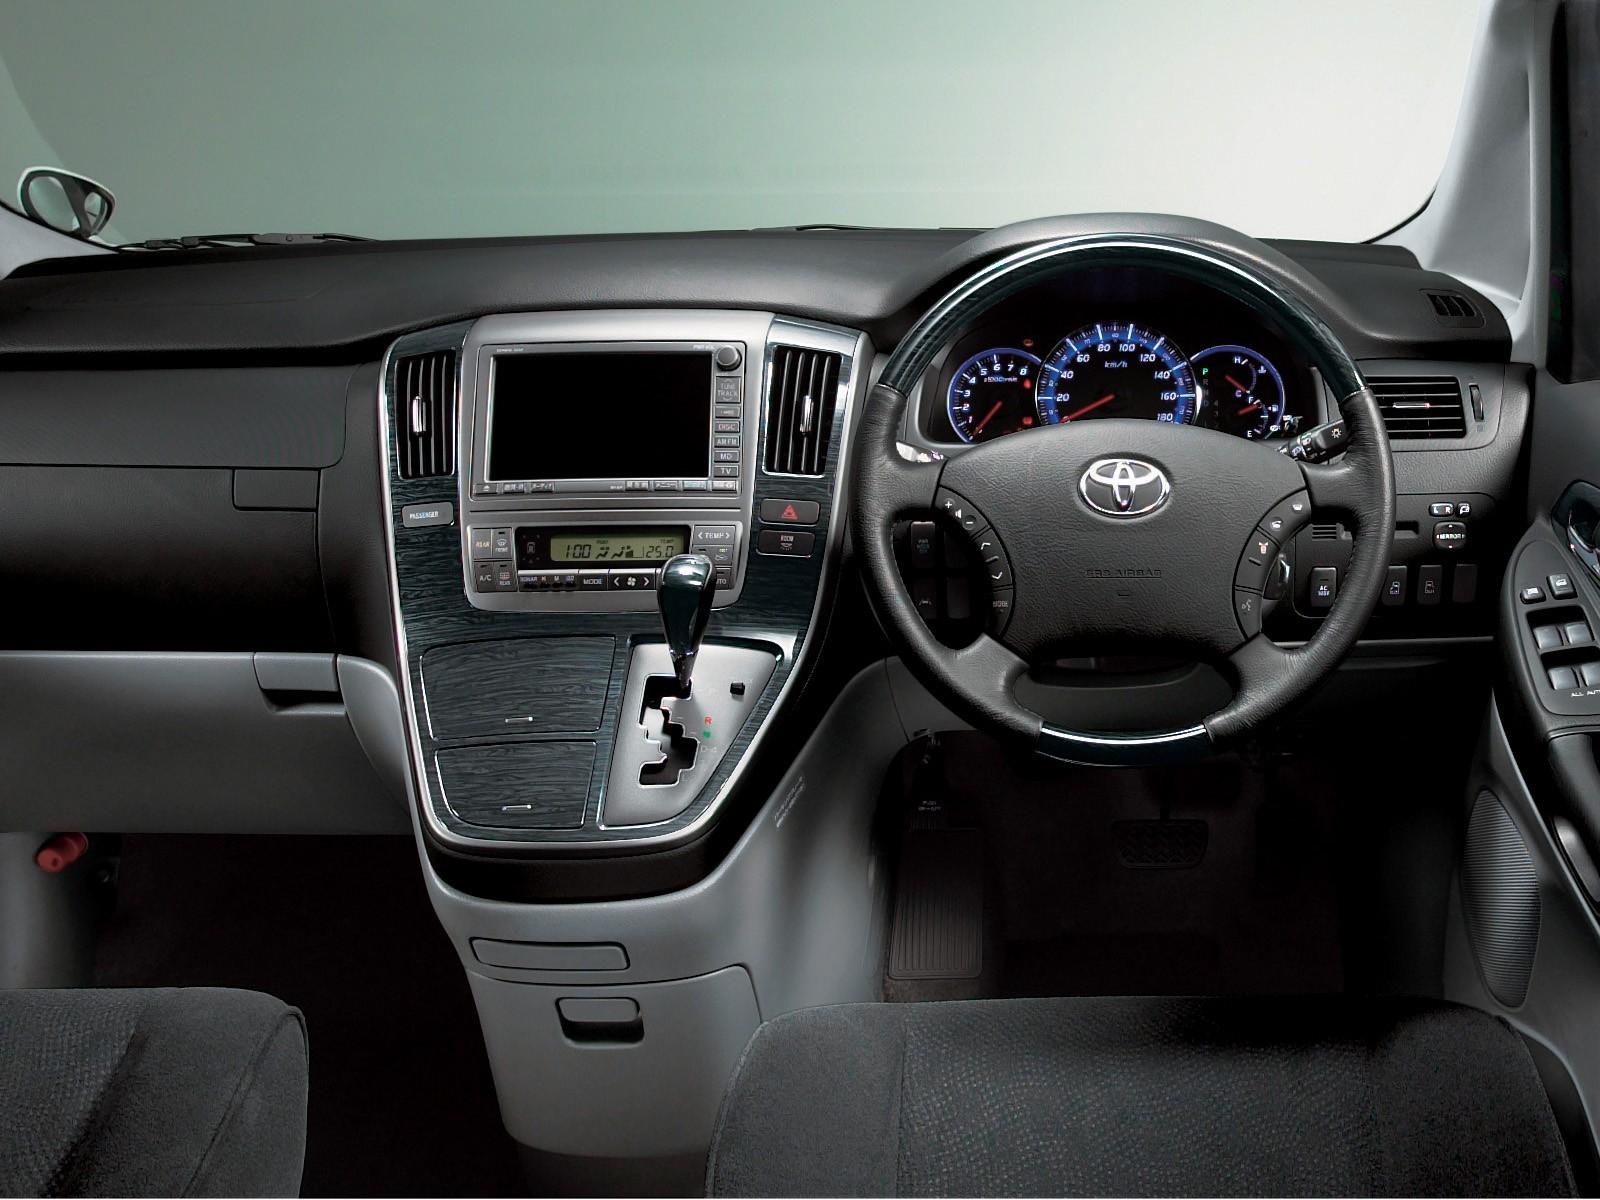 Toyota Alphard Specs 2002 2003 2004 2005 2006 2007